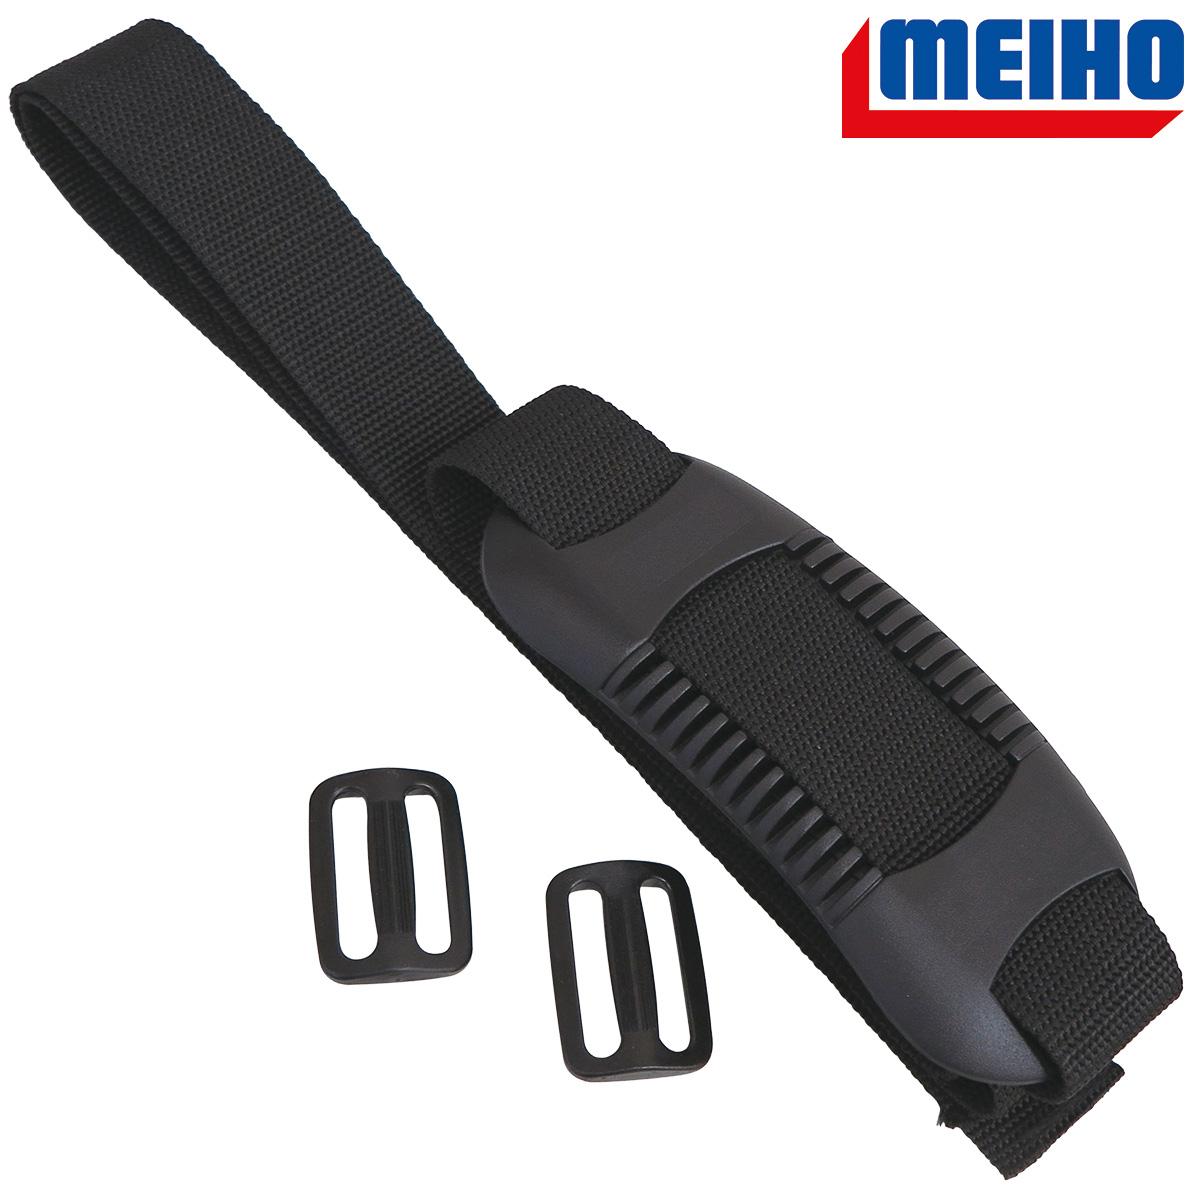 "MEIHO ""BM-200 HARD BELT"" Schultergurt"